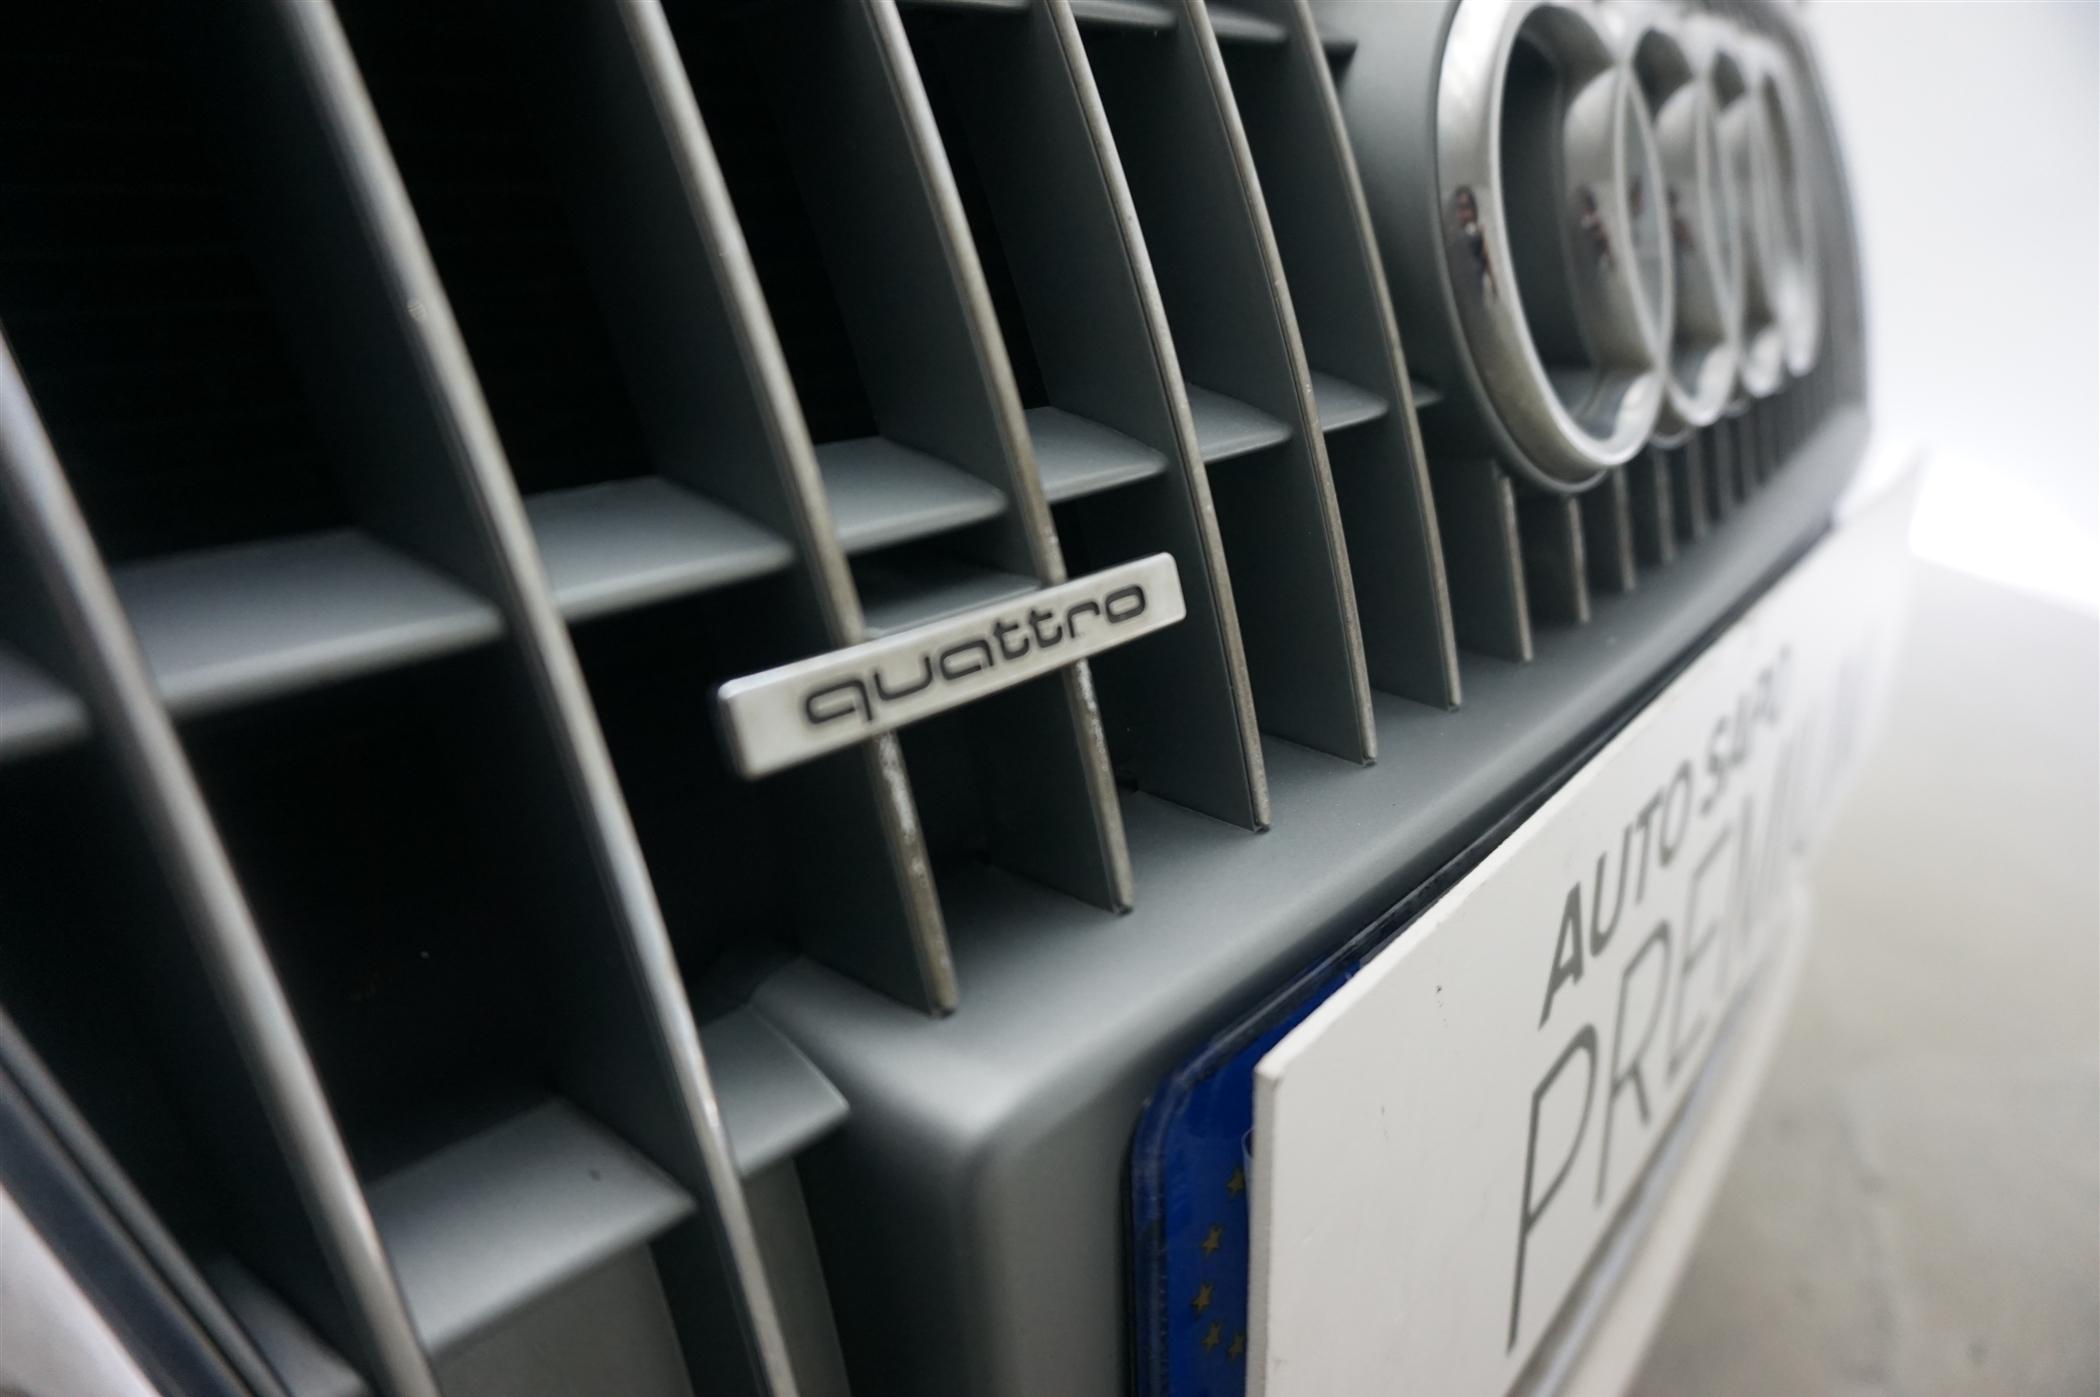 Audi A4 Allroad 2.0 TDi quattro